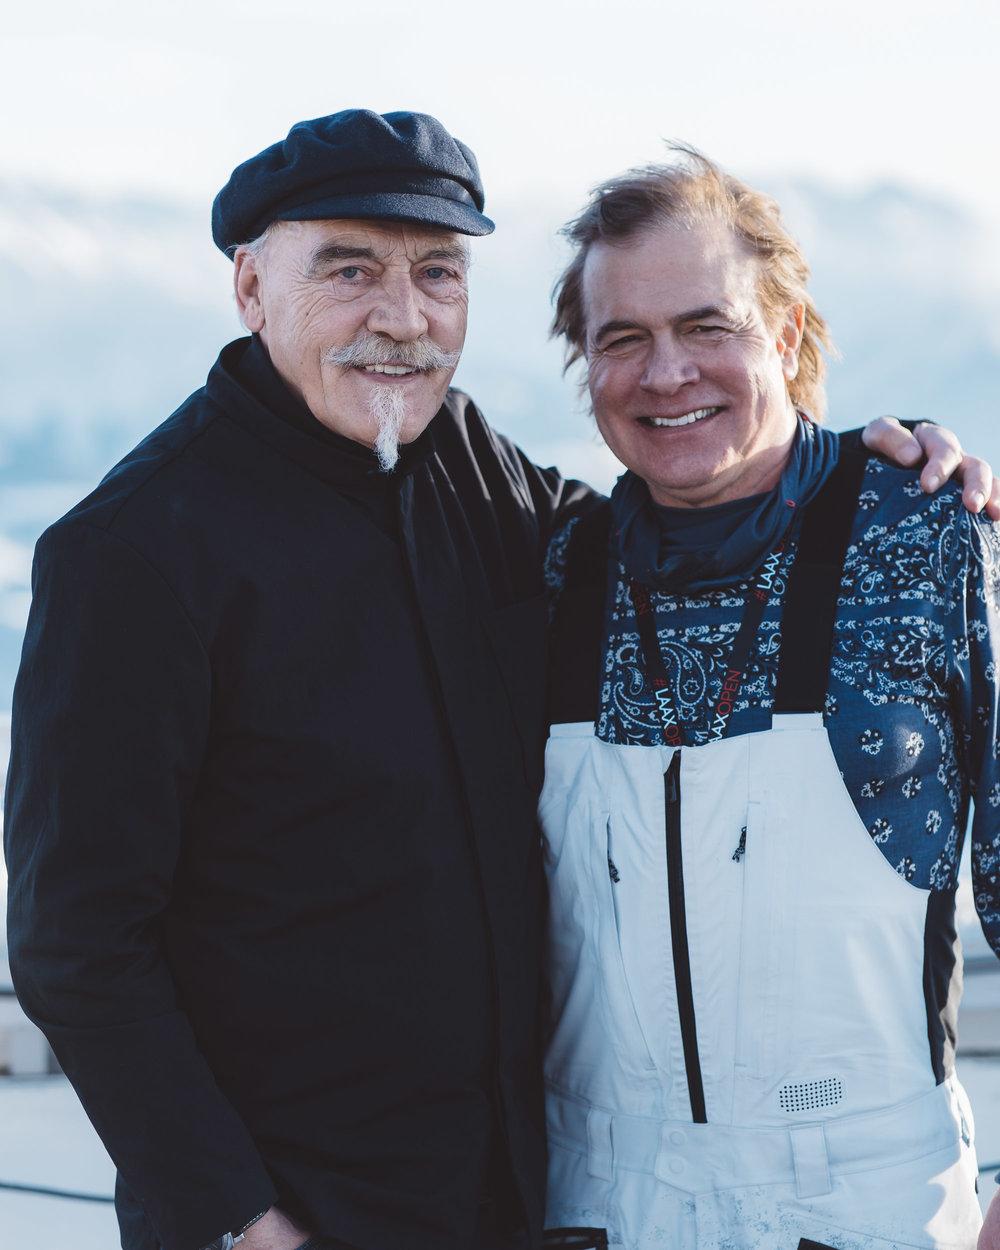 CEO of Laax Reto Gurtner with founder of Burton Snowboards Jake Burton